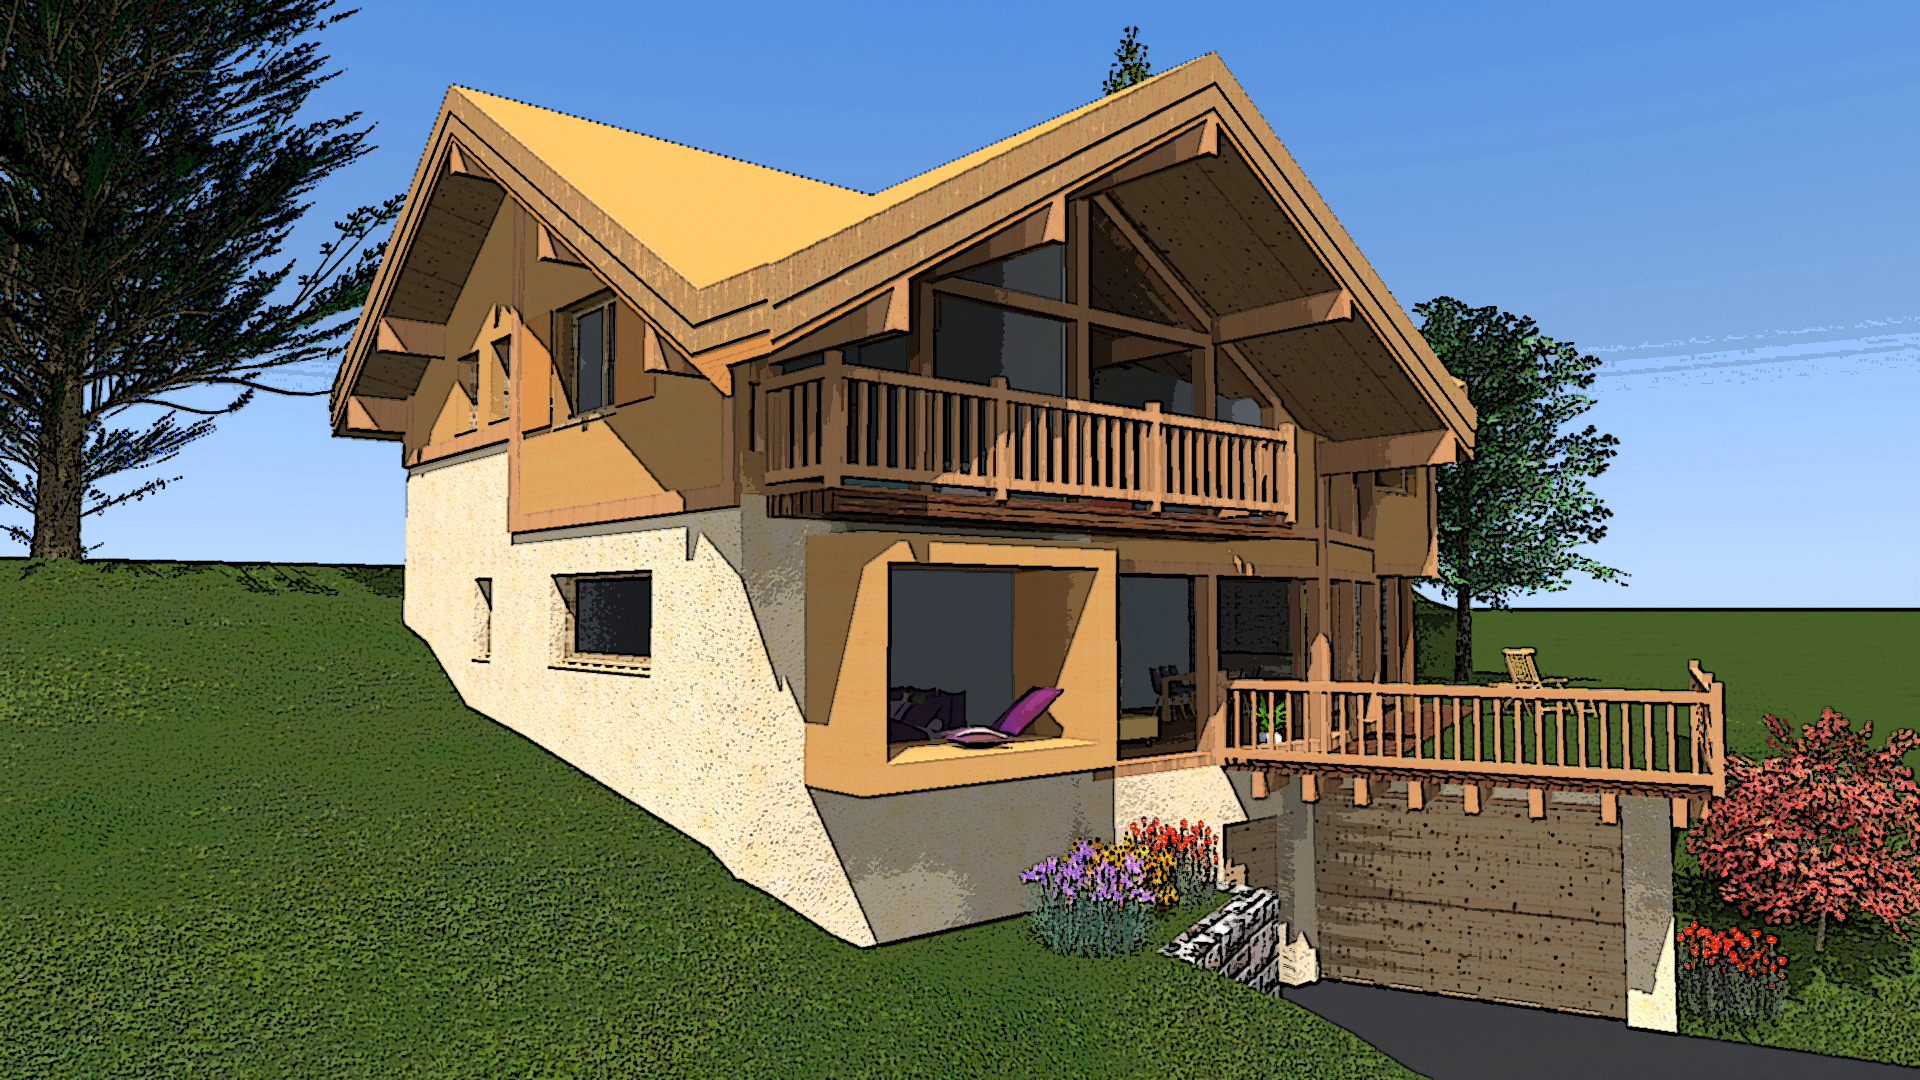 vente sur plan avec terrain lombard vasina. Black Bedroom Furniture Sets. Home Design Ideas